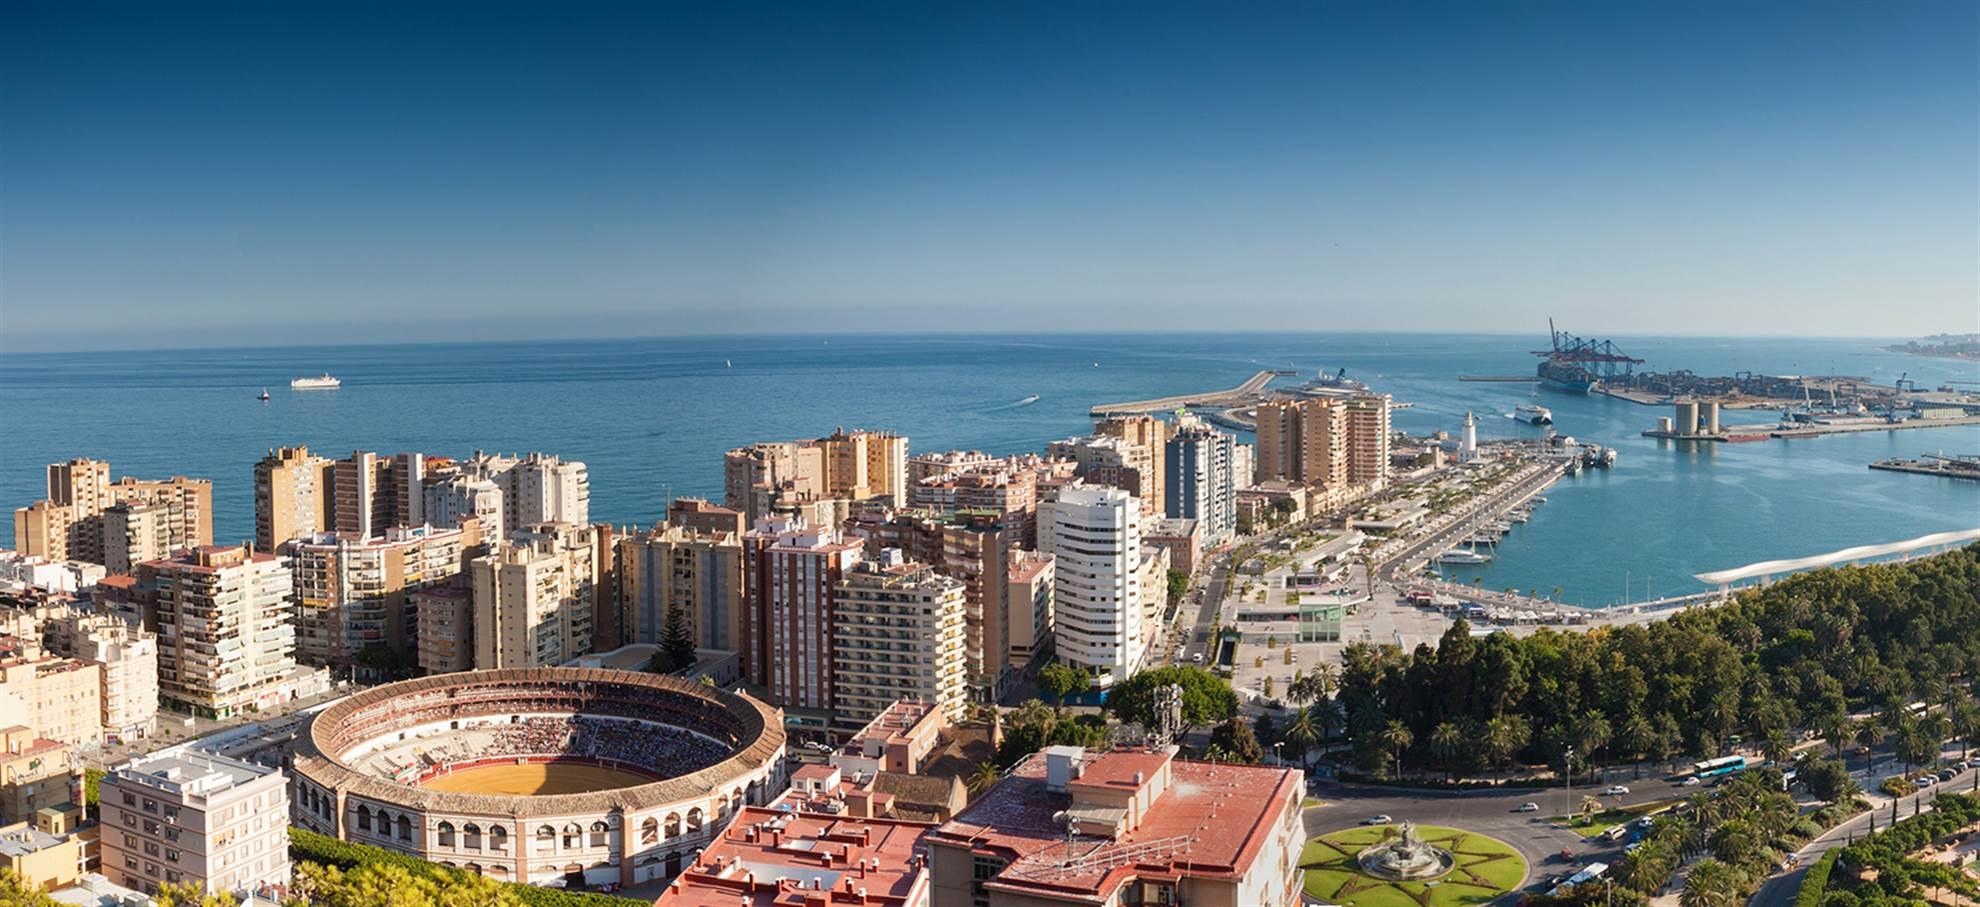 Malaga highlights fietstour